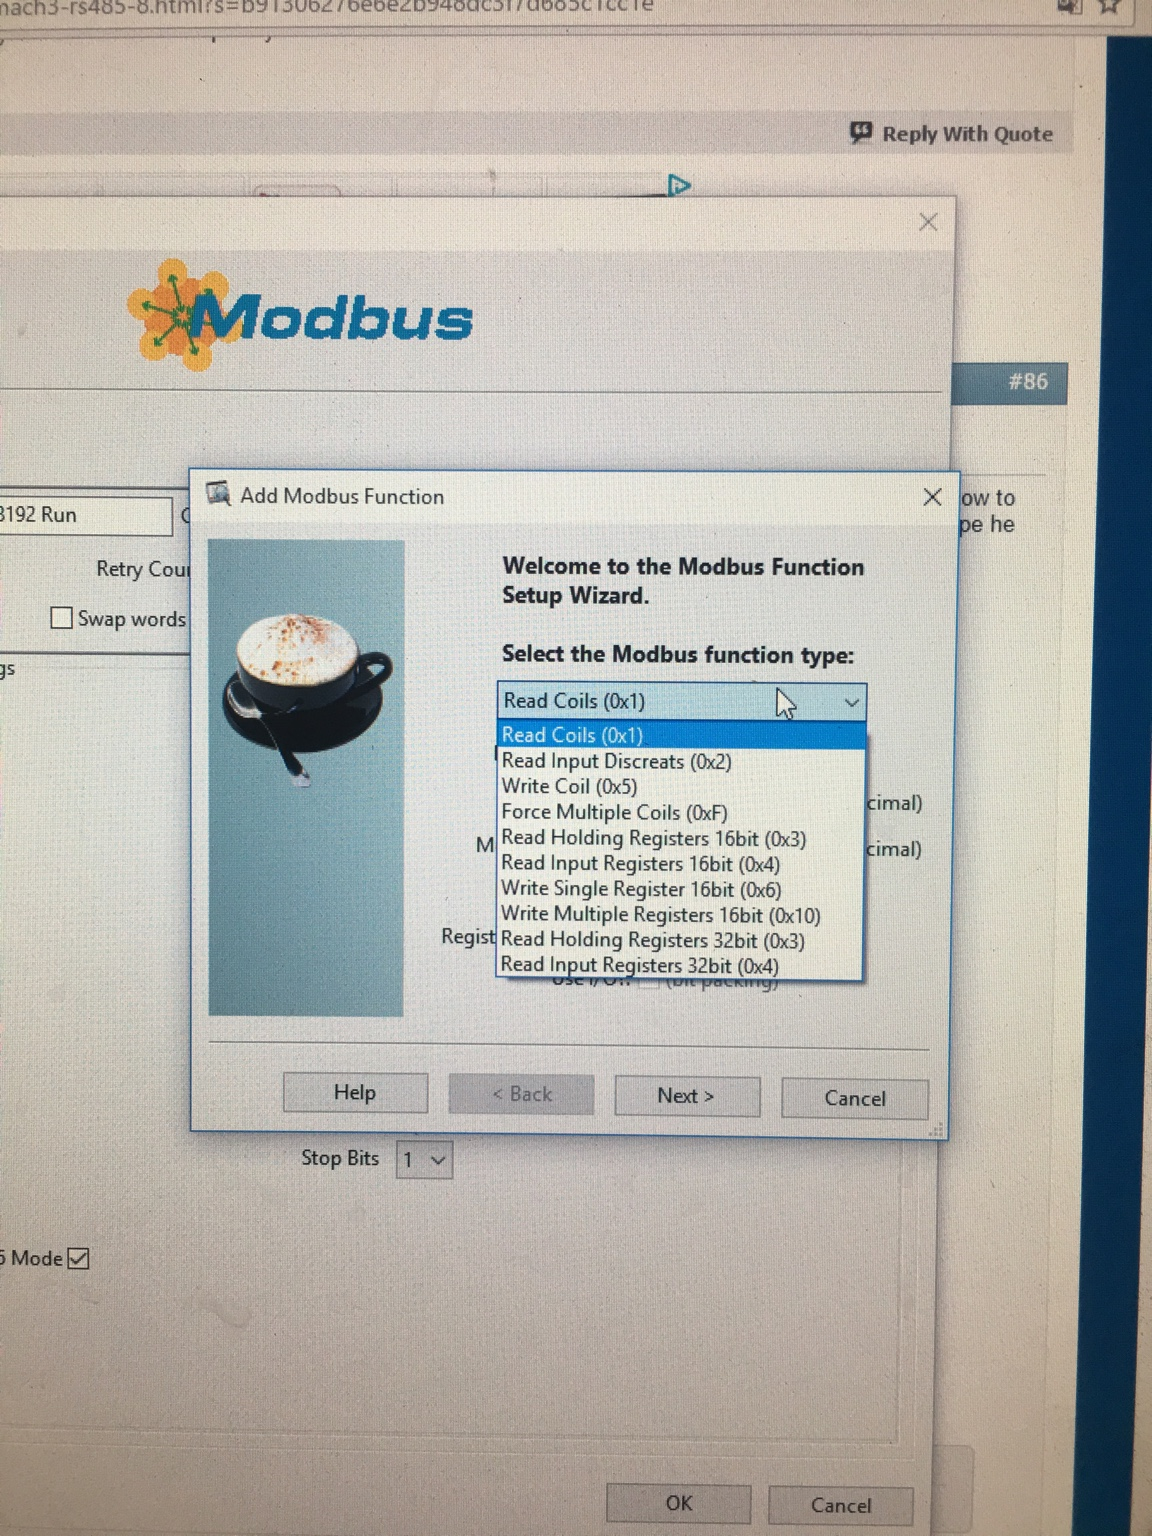 Spindles / VFD > Machtric S800E Mach4 Modbus configuration